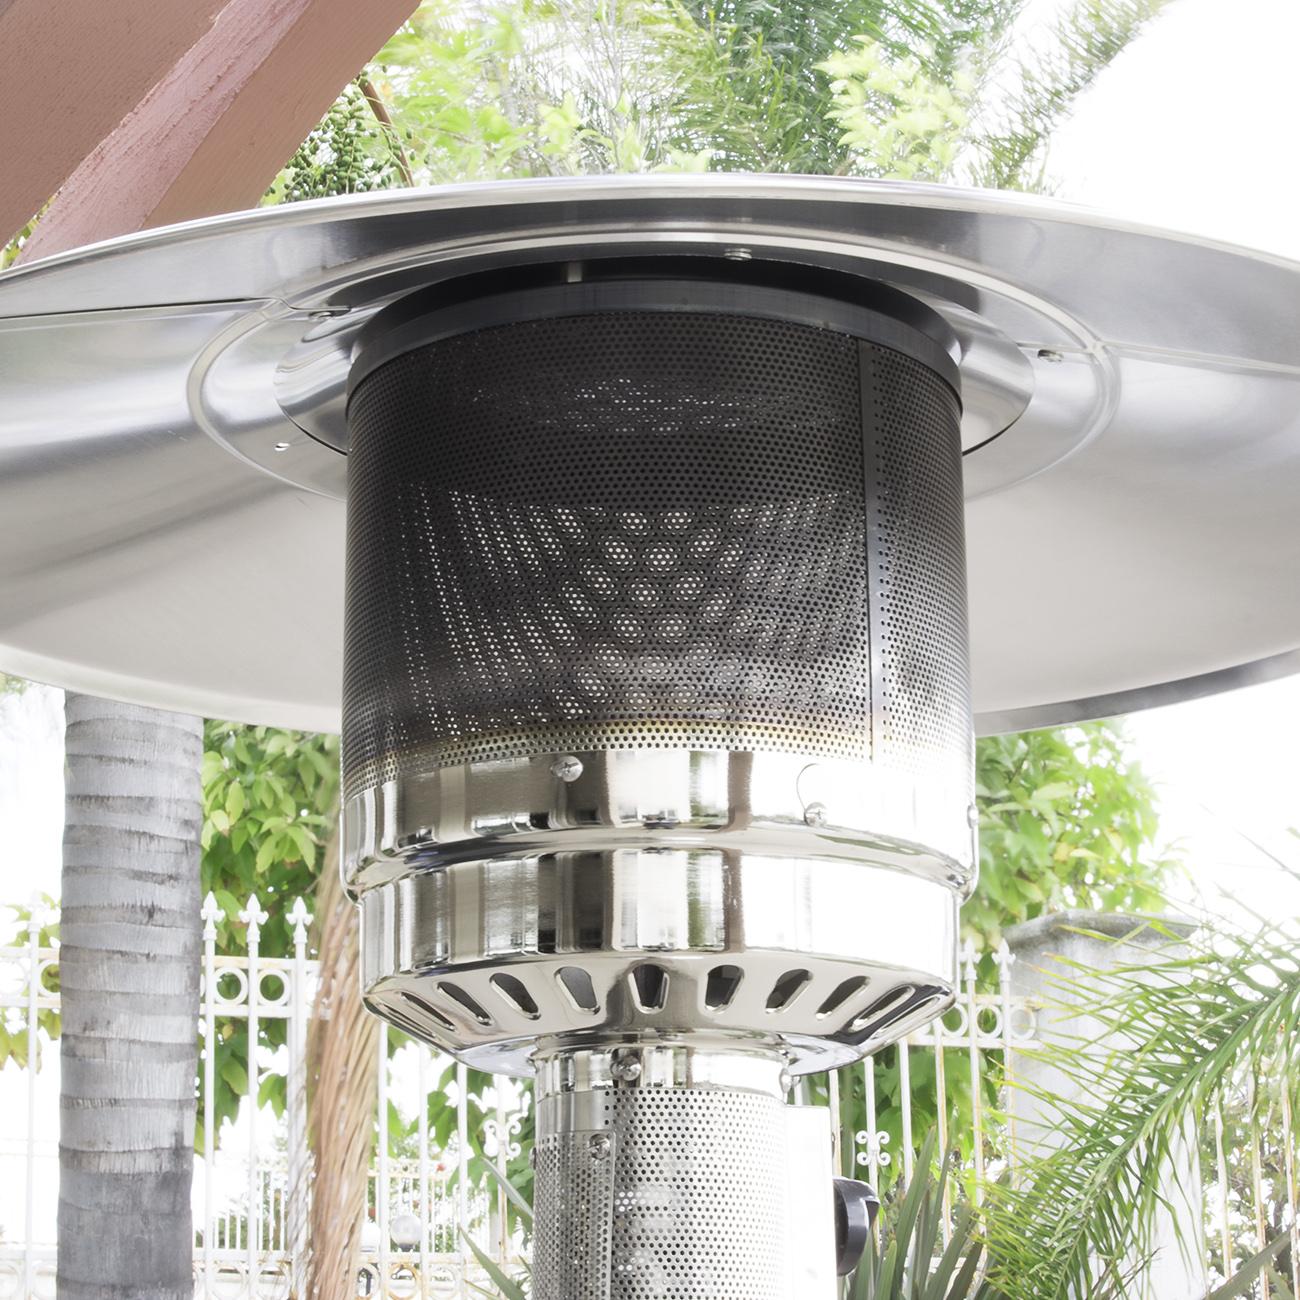 NEW 48 000 BTU Outdoor Patio Heater Propane